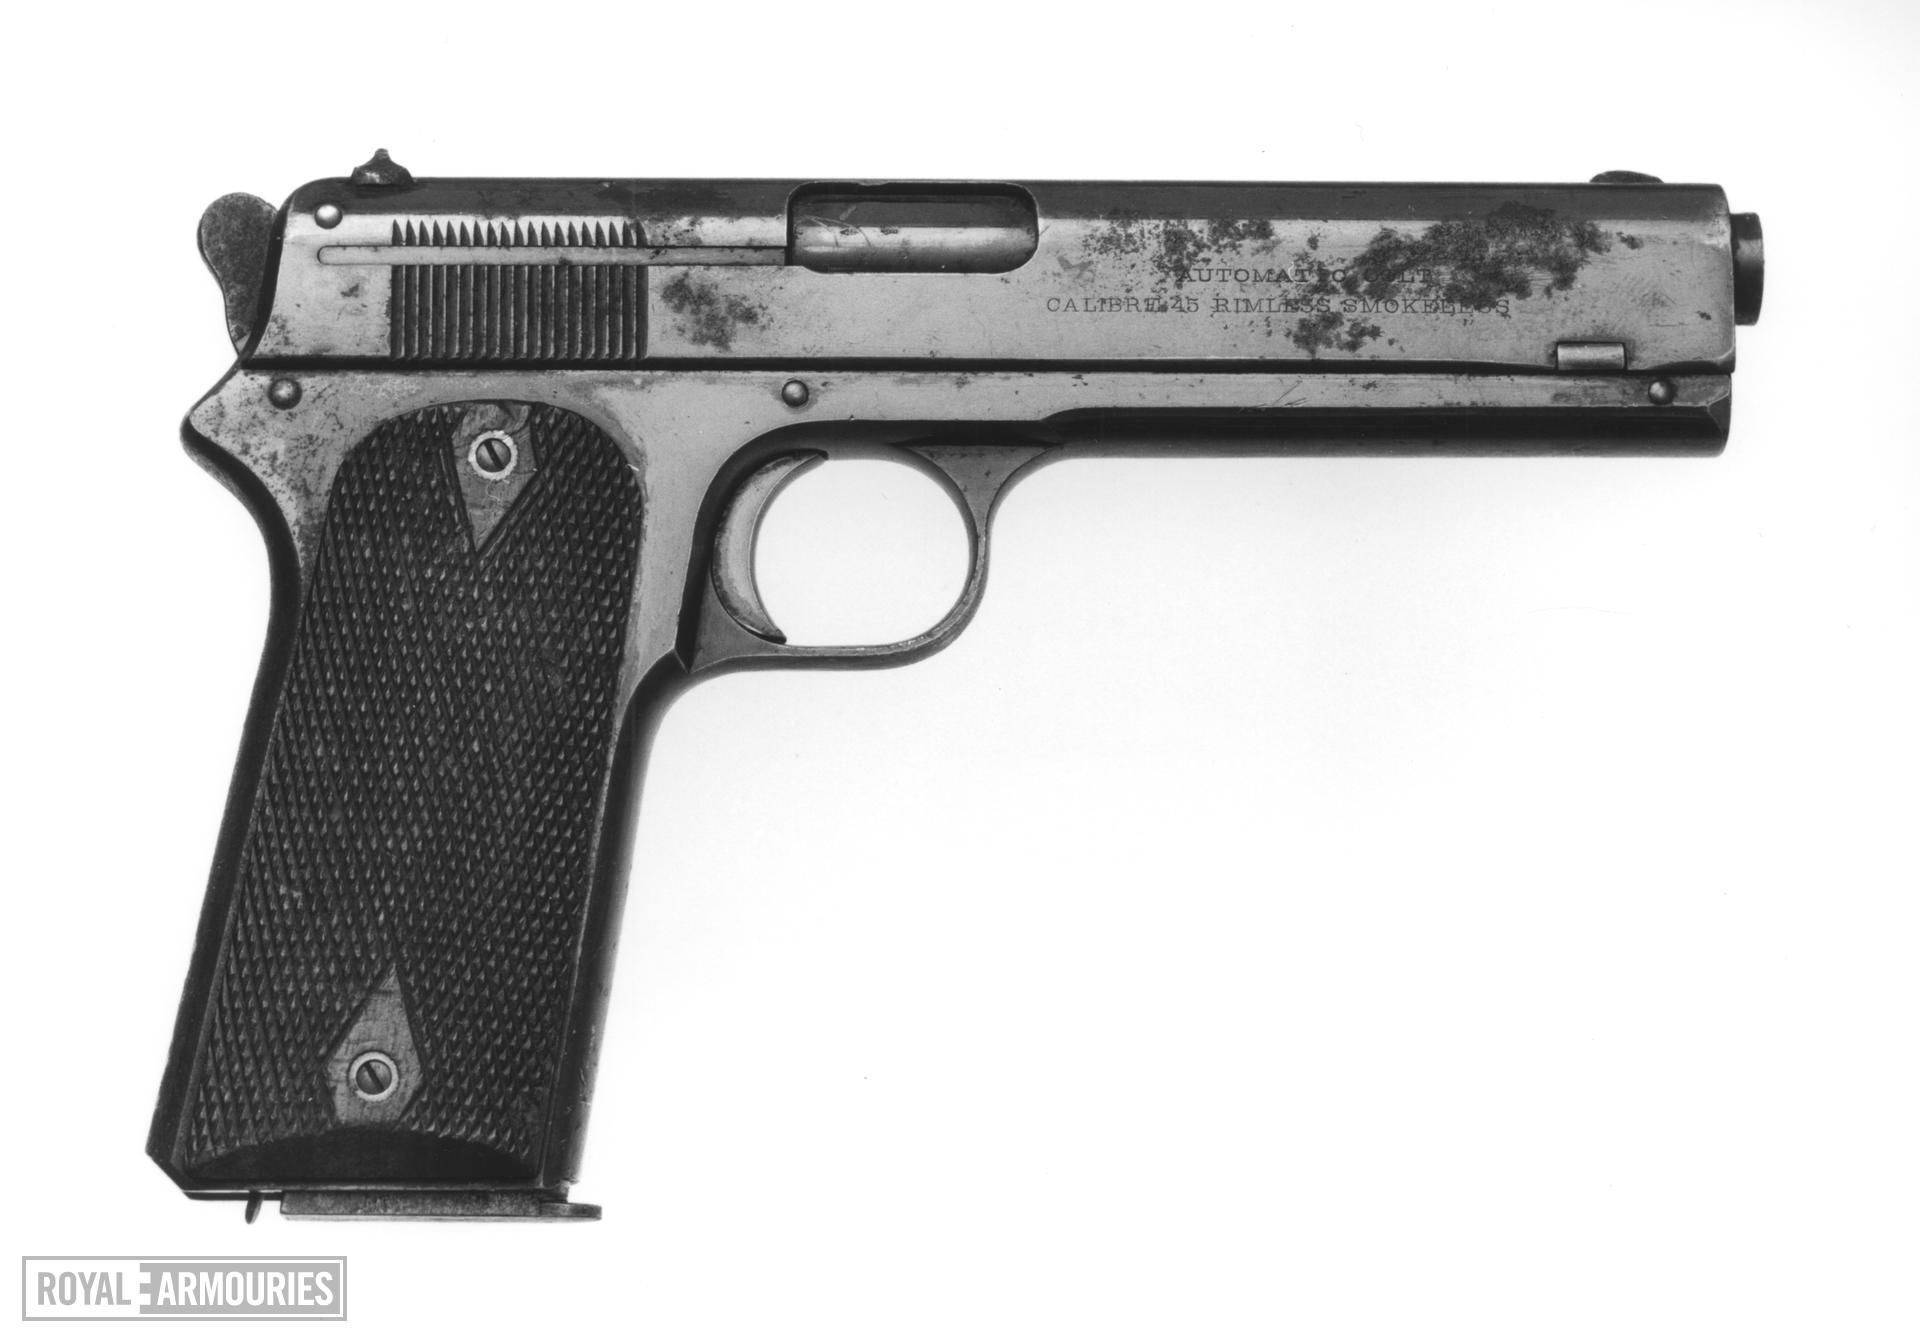 Centrefire self-loading military pistol - Colt 1911 A1 By Remington Rand Inc. Syracuse, N.Y